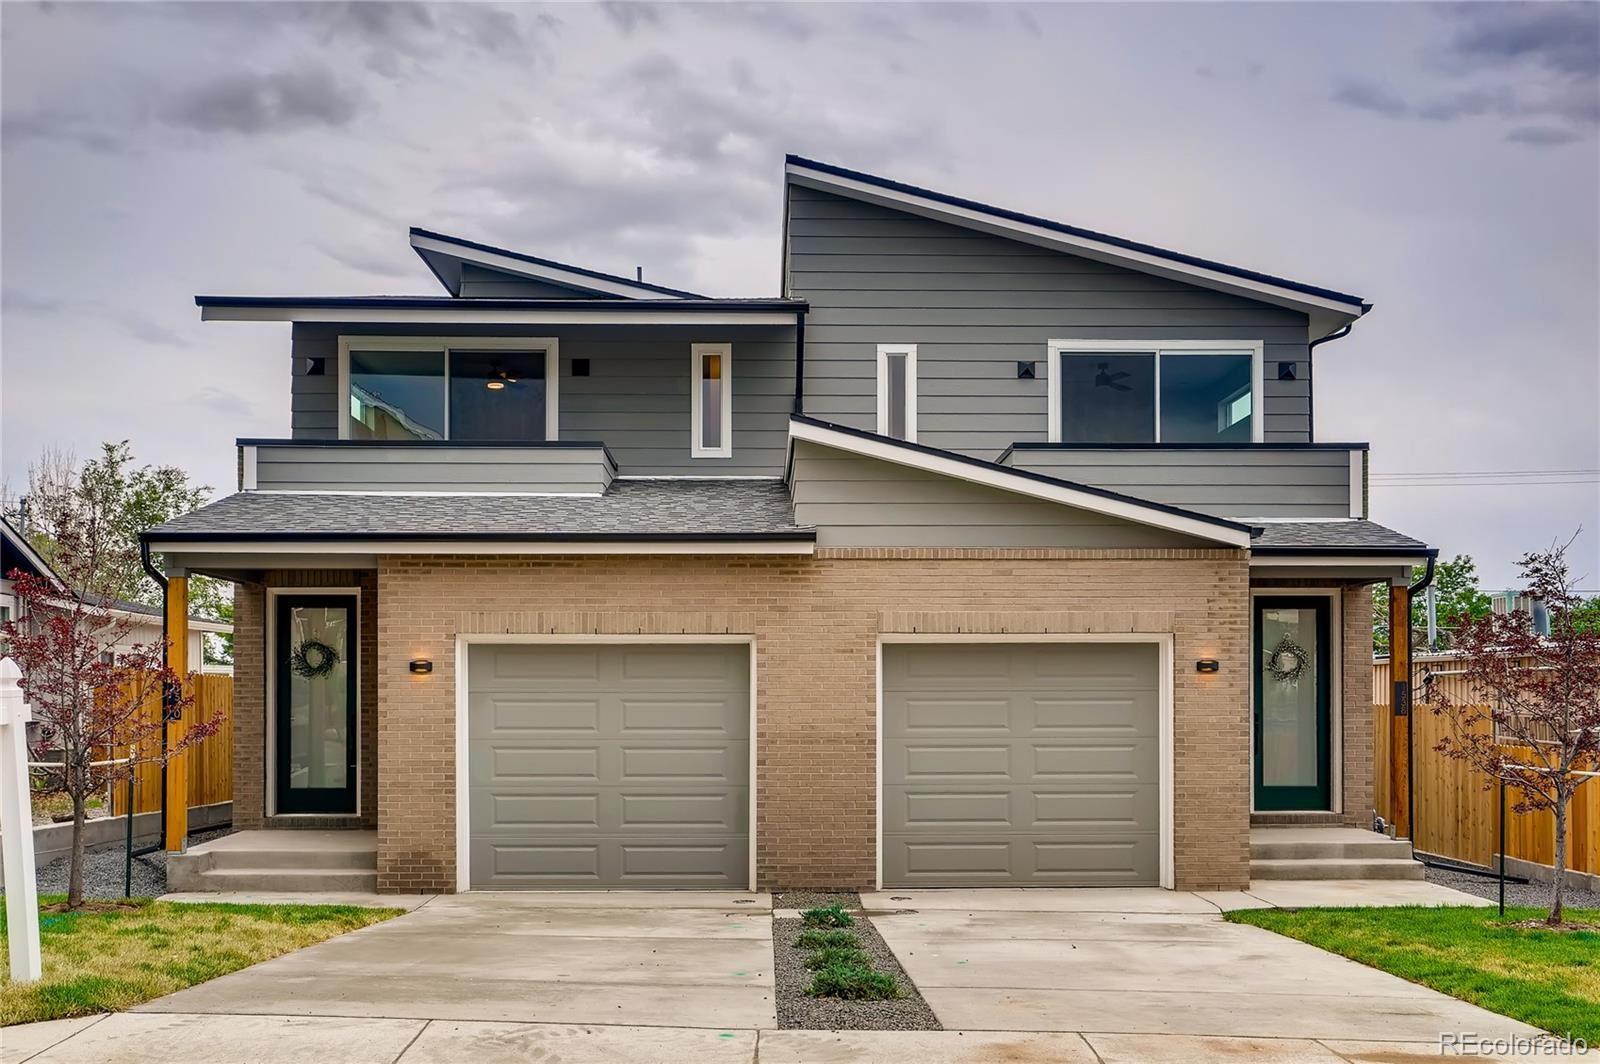 1538 Tabor Street, Lakewood, CO 80215 - #: 5134906